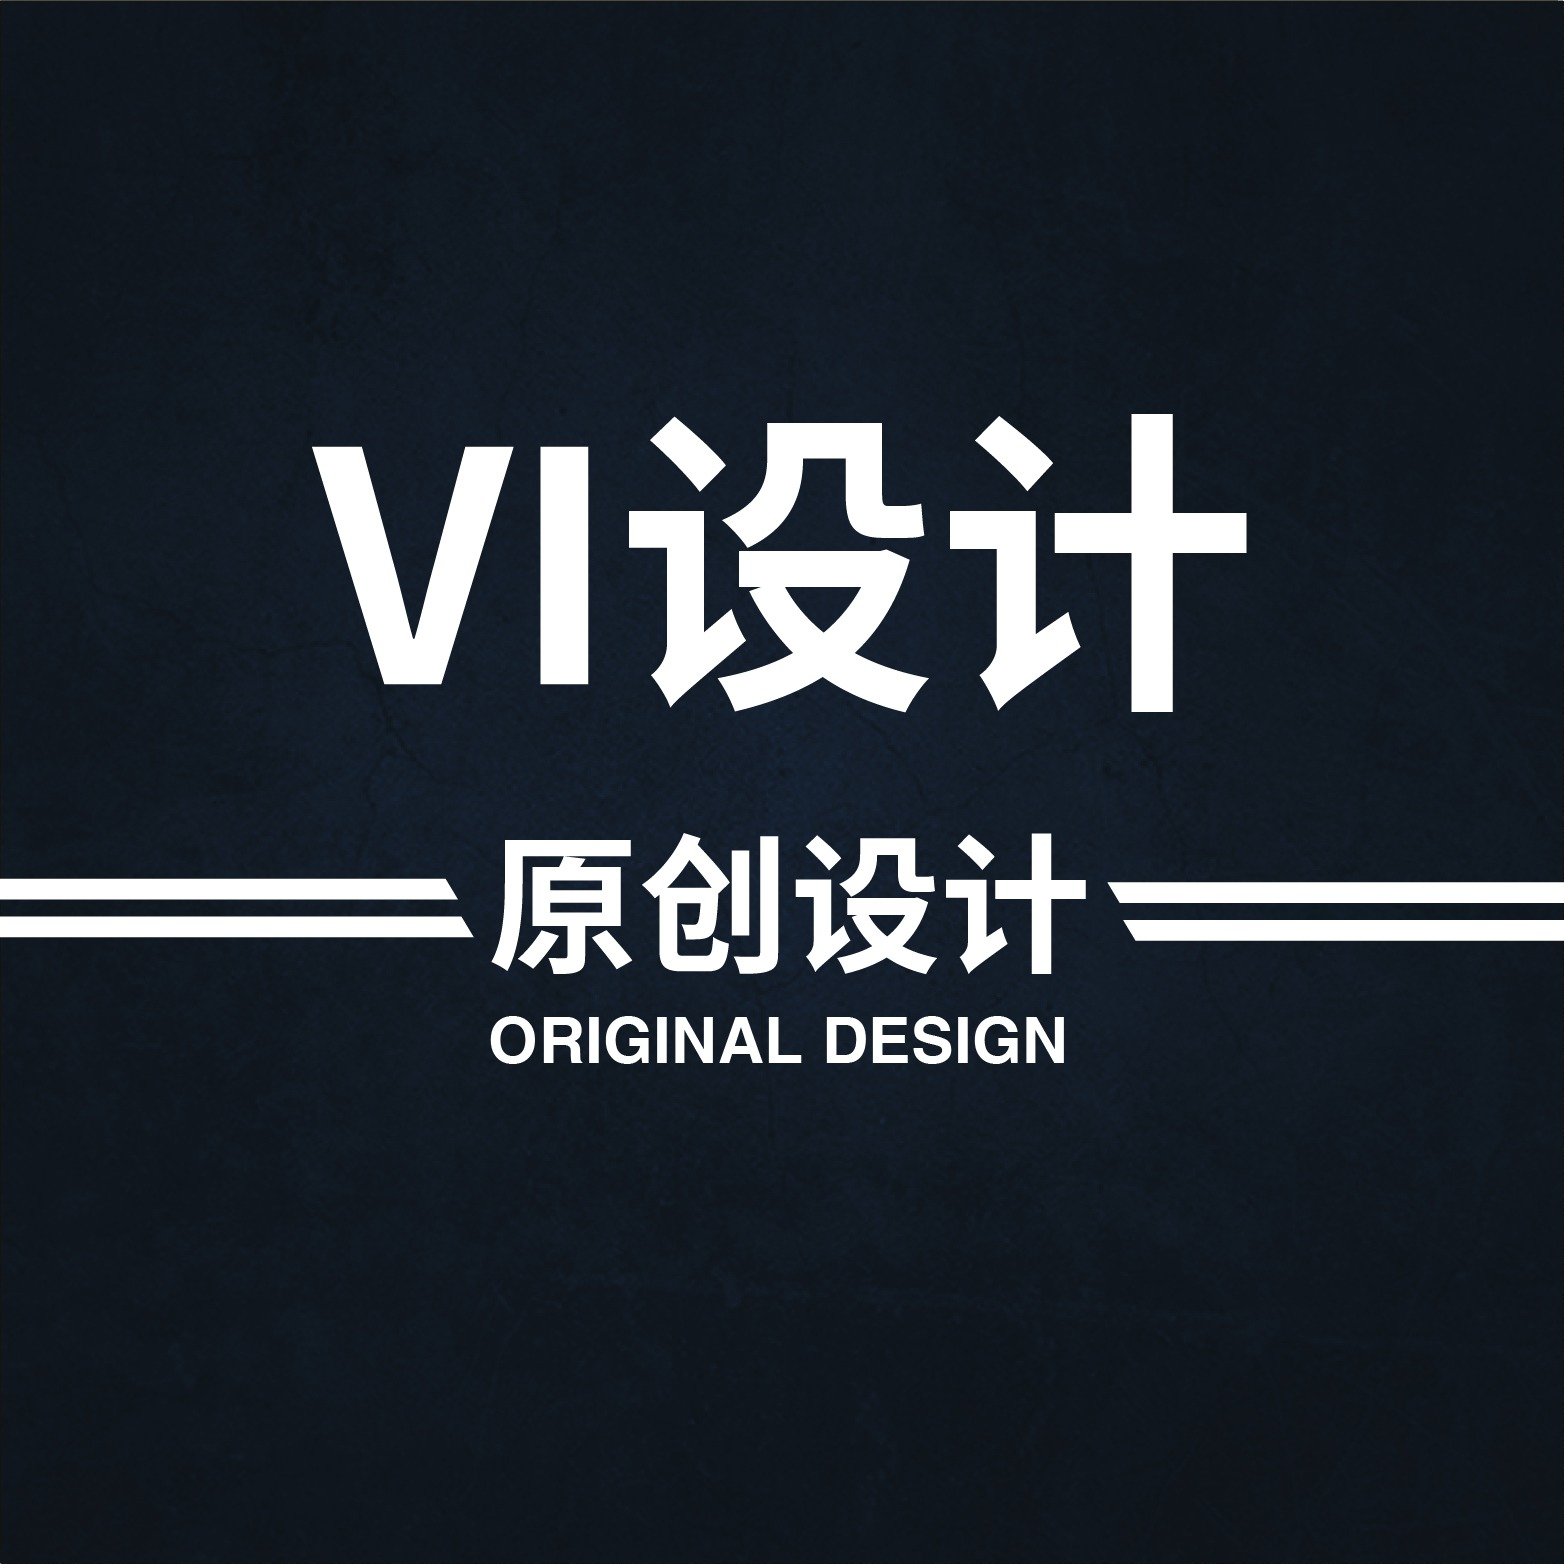 VI设计教育文化VI设计K12教育成人教育企业vi